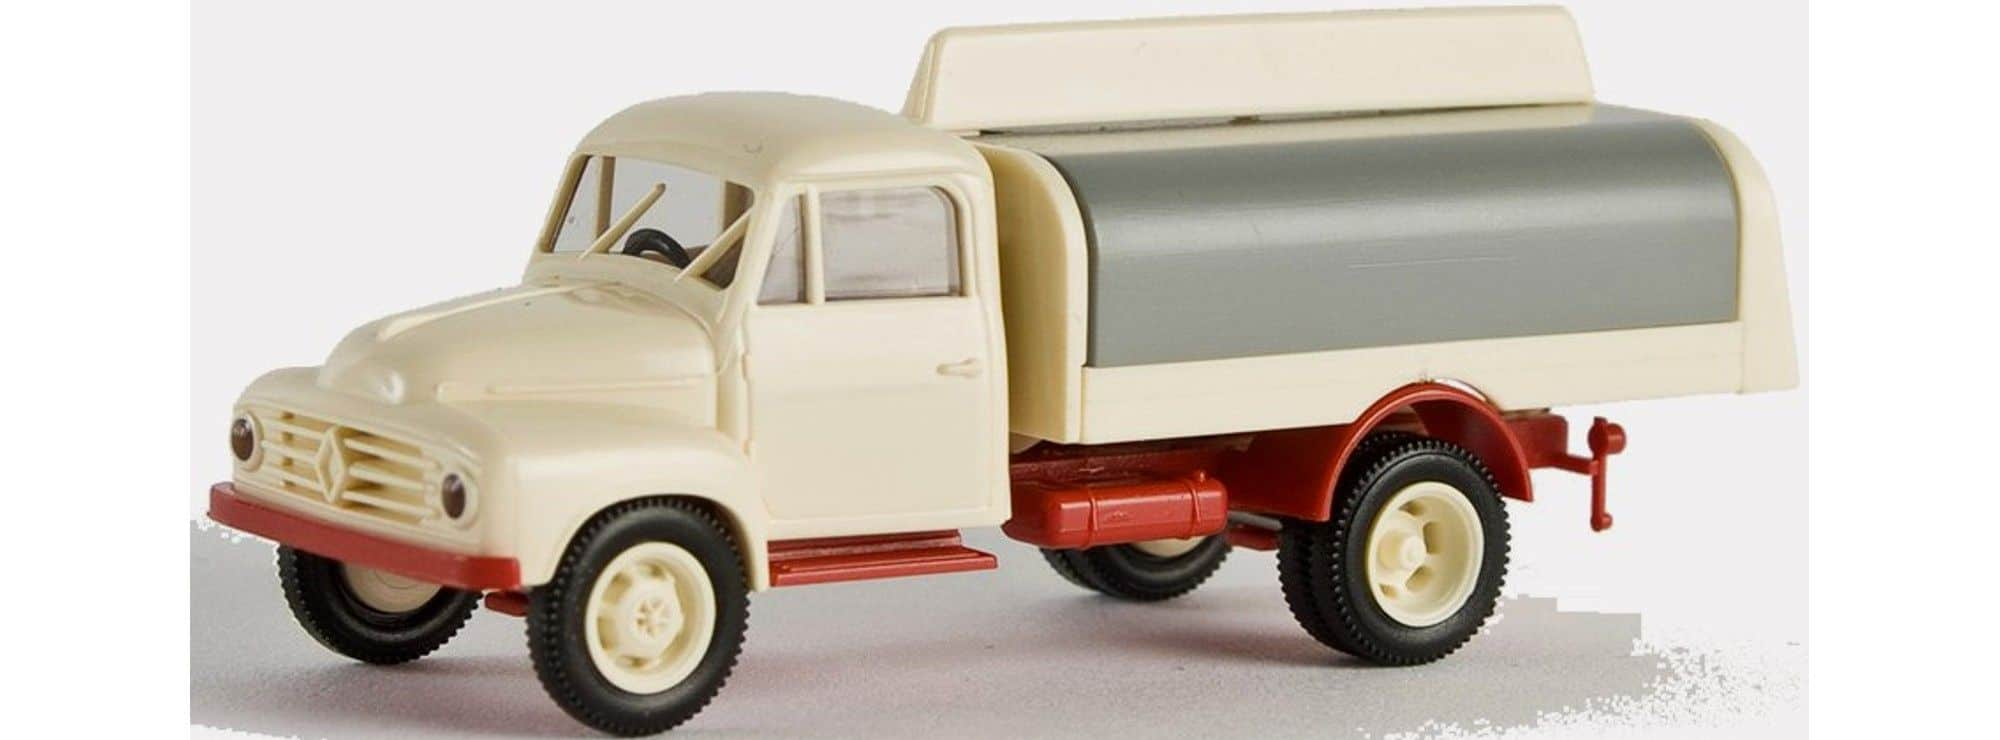 Borgward-B1500-model